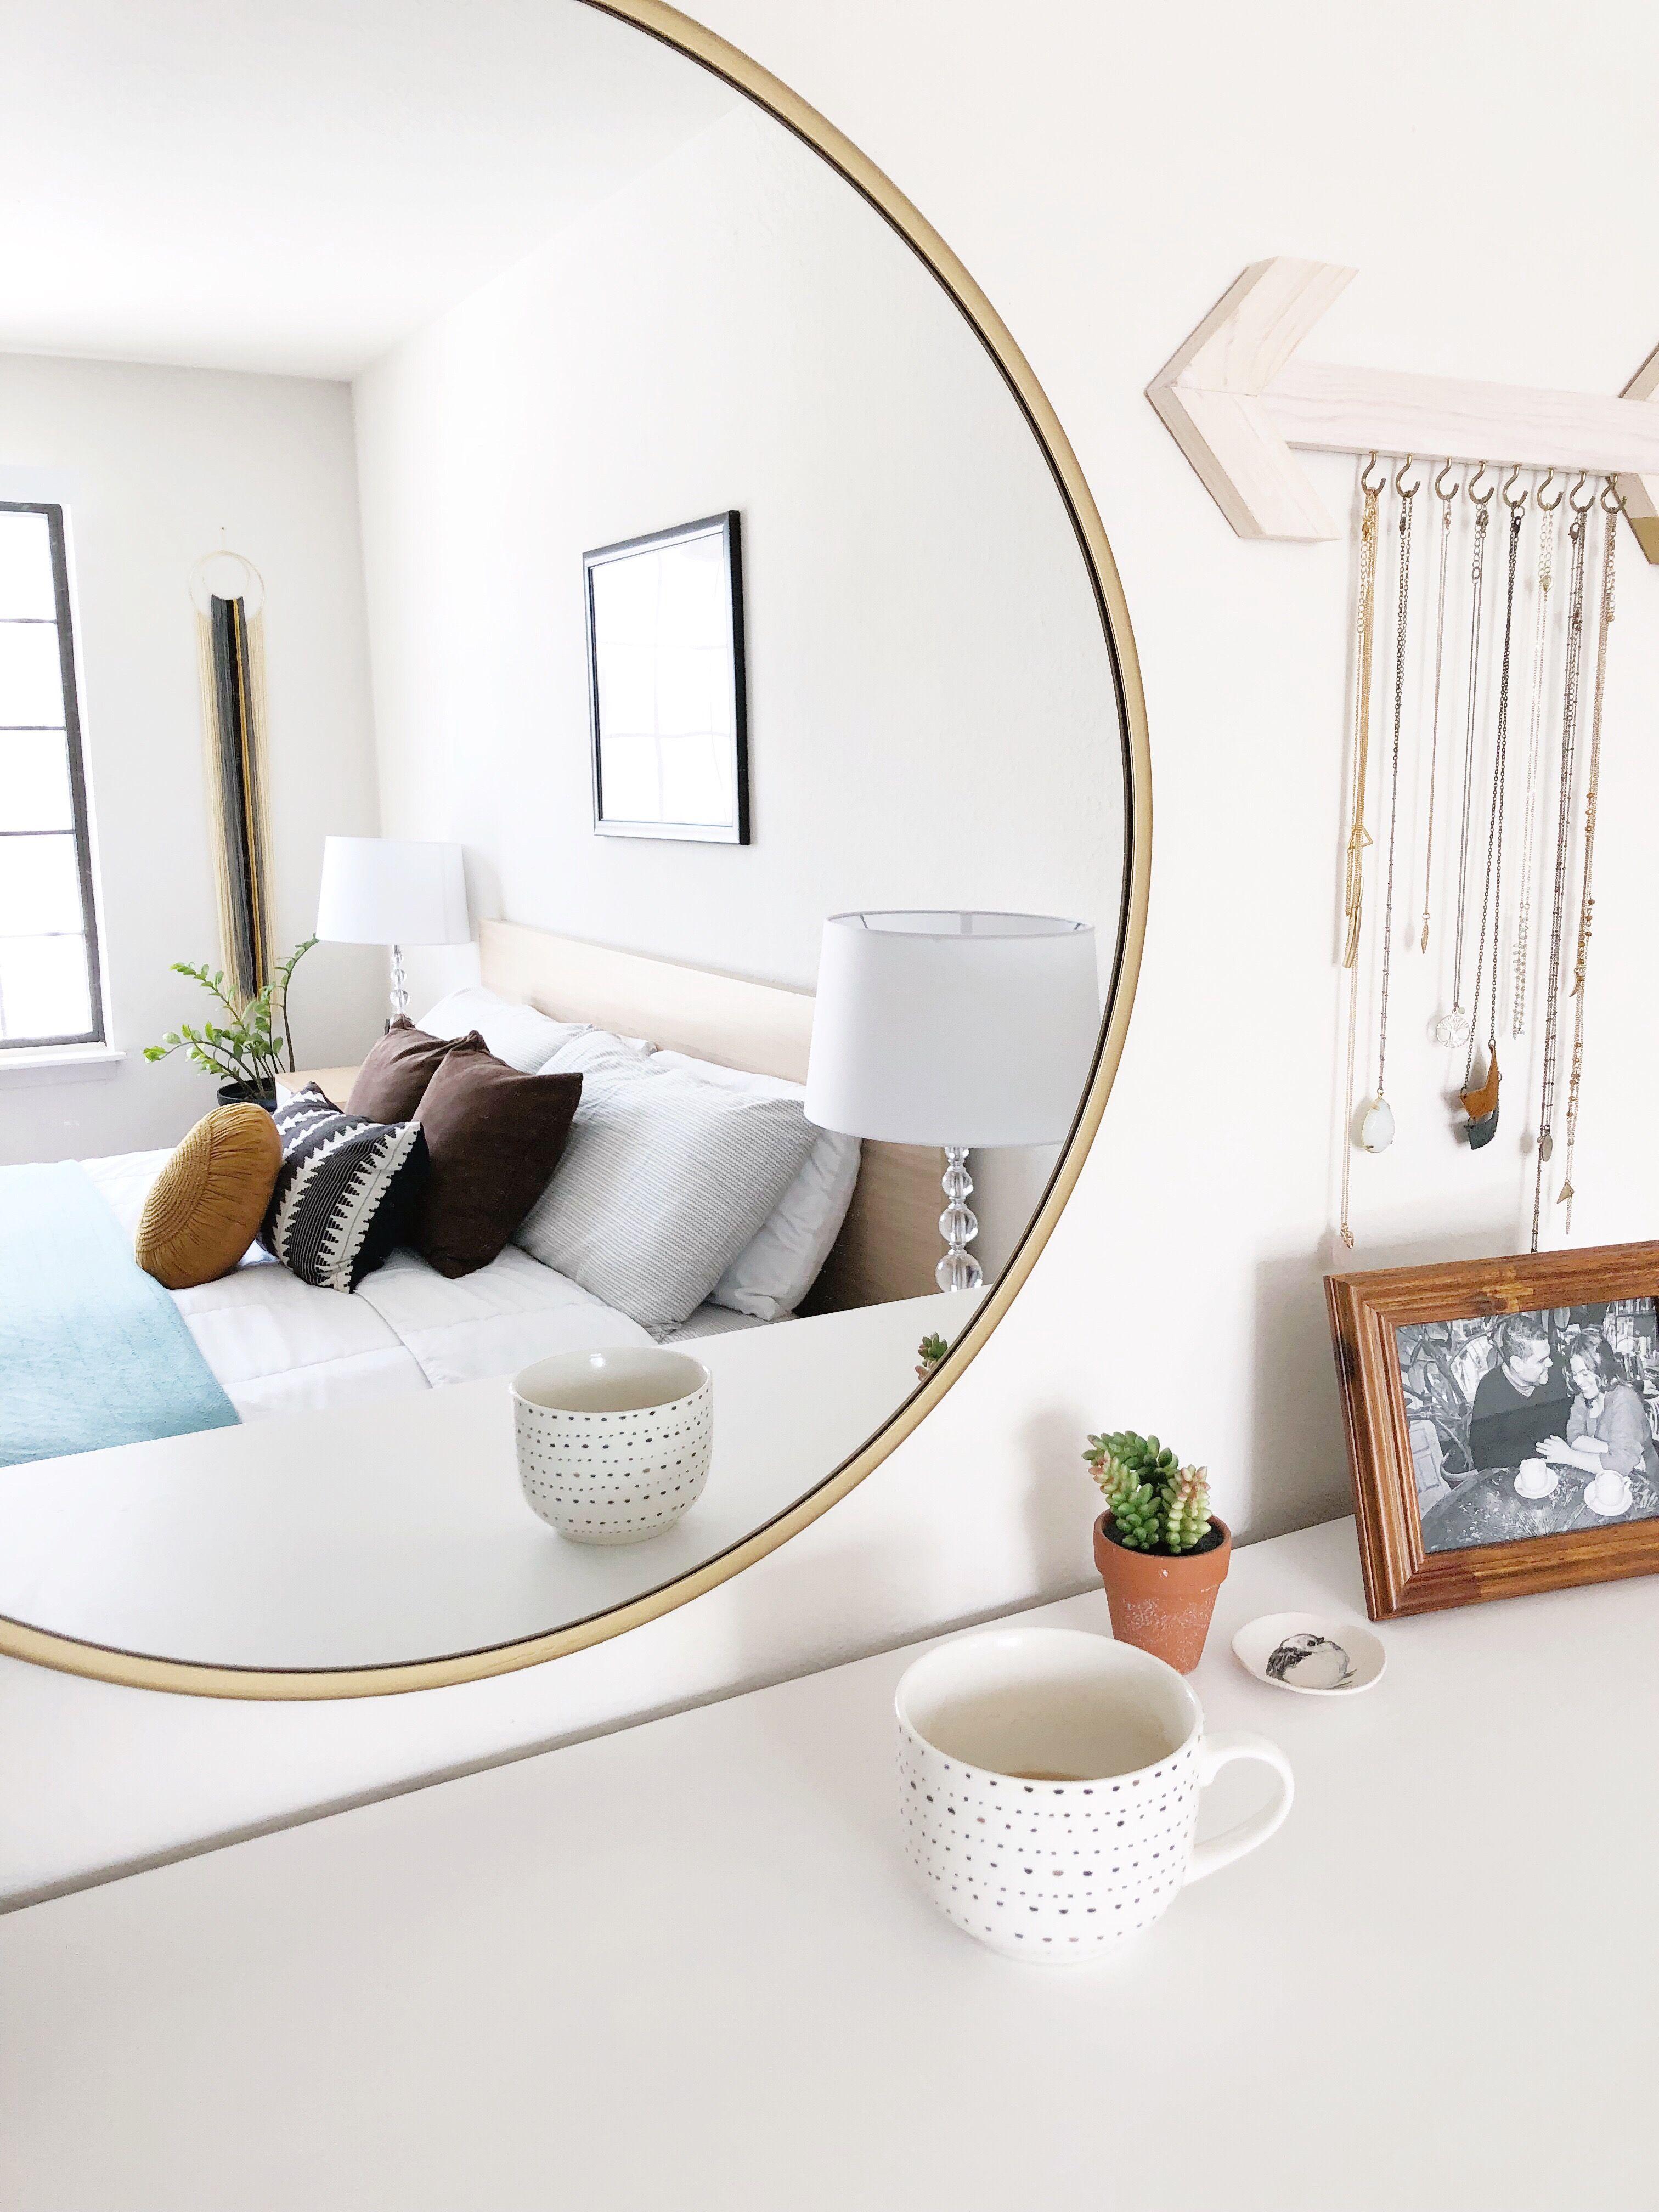 Modern Boho Bedroom | Bohemian Decor | Modern Decor ... on Boho Bedroom Ideas On A Budget  id=36815